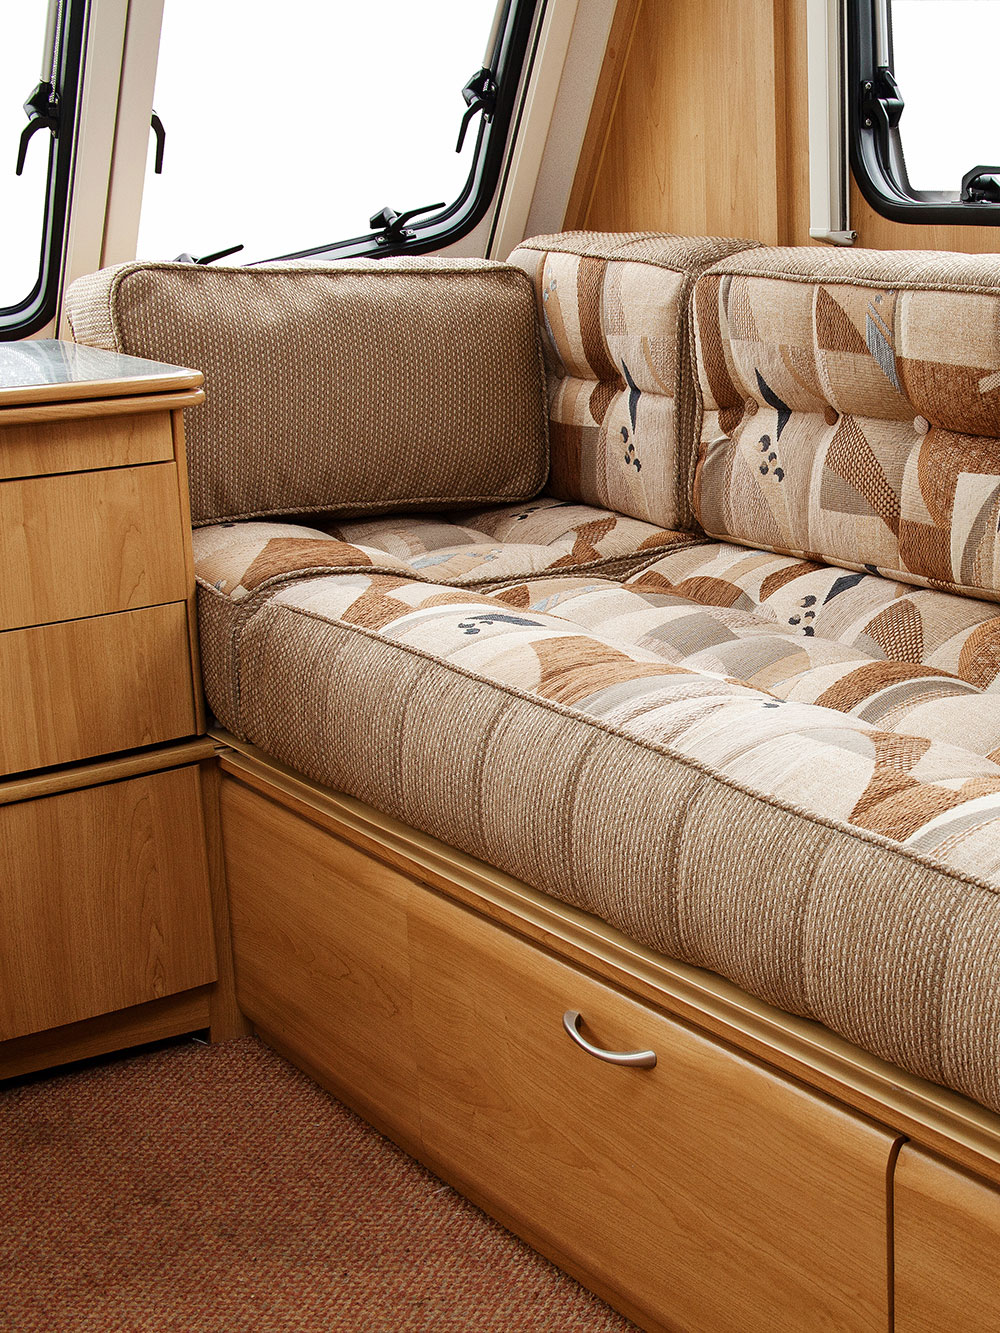 Touring Caravan Bedding And Mattresses Jonic Uk